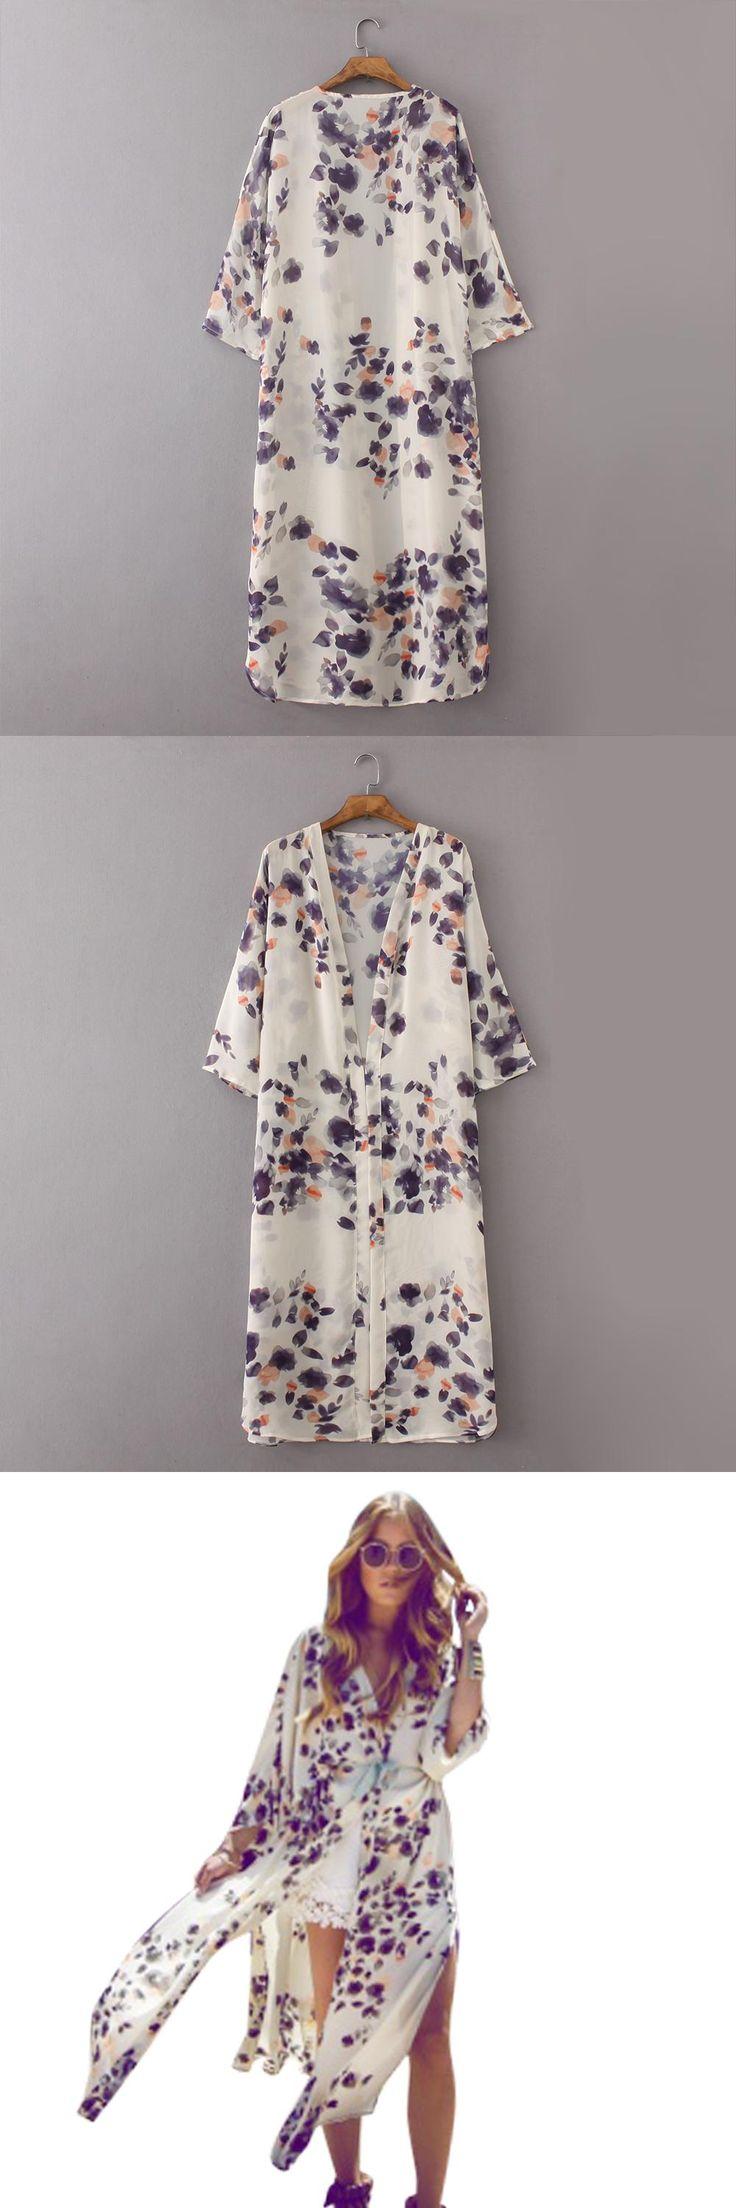 2017 Long Kimono Women  Floral Print Cardigan Vintage Summer Chiffon Kimonos Mujer Ropa Casual Blouses Shirts Beach Cape Knits